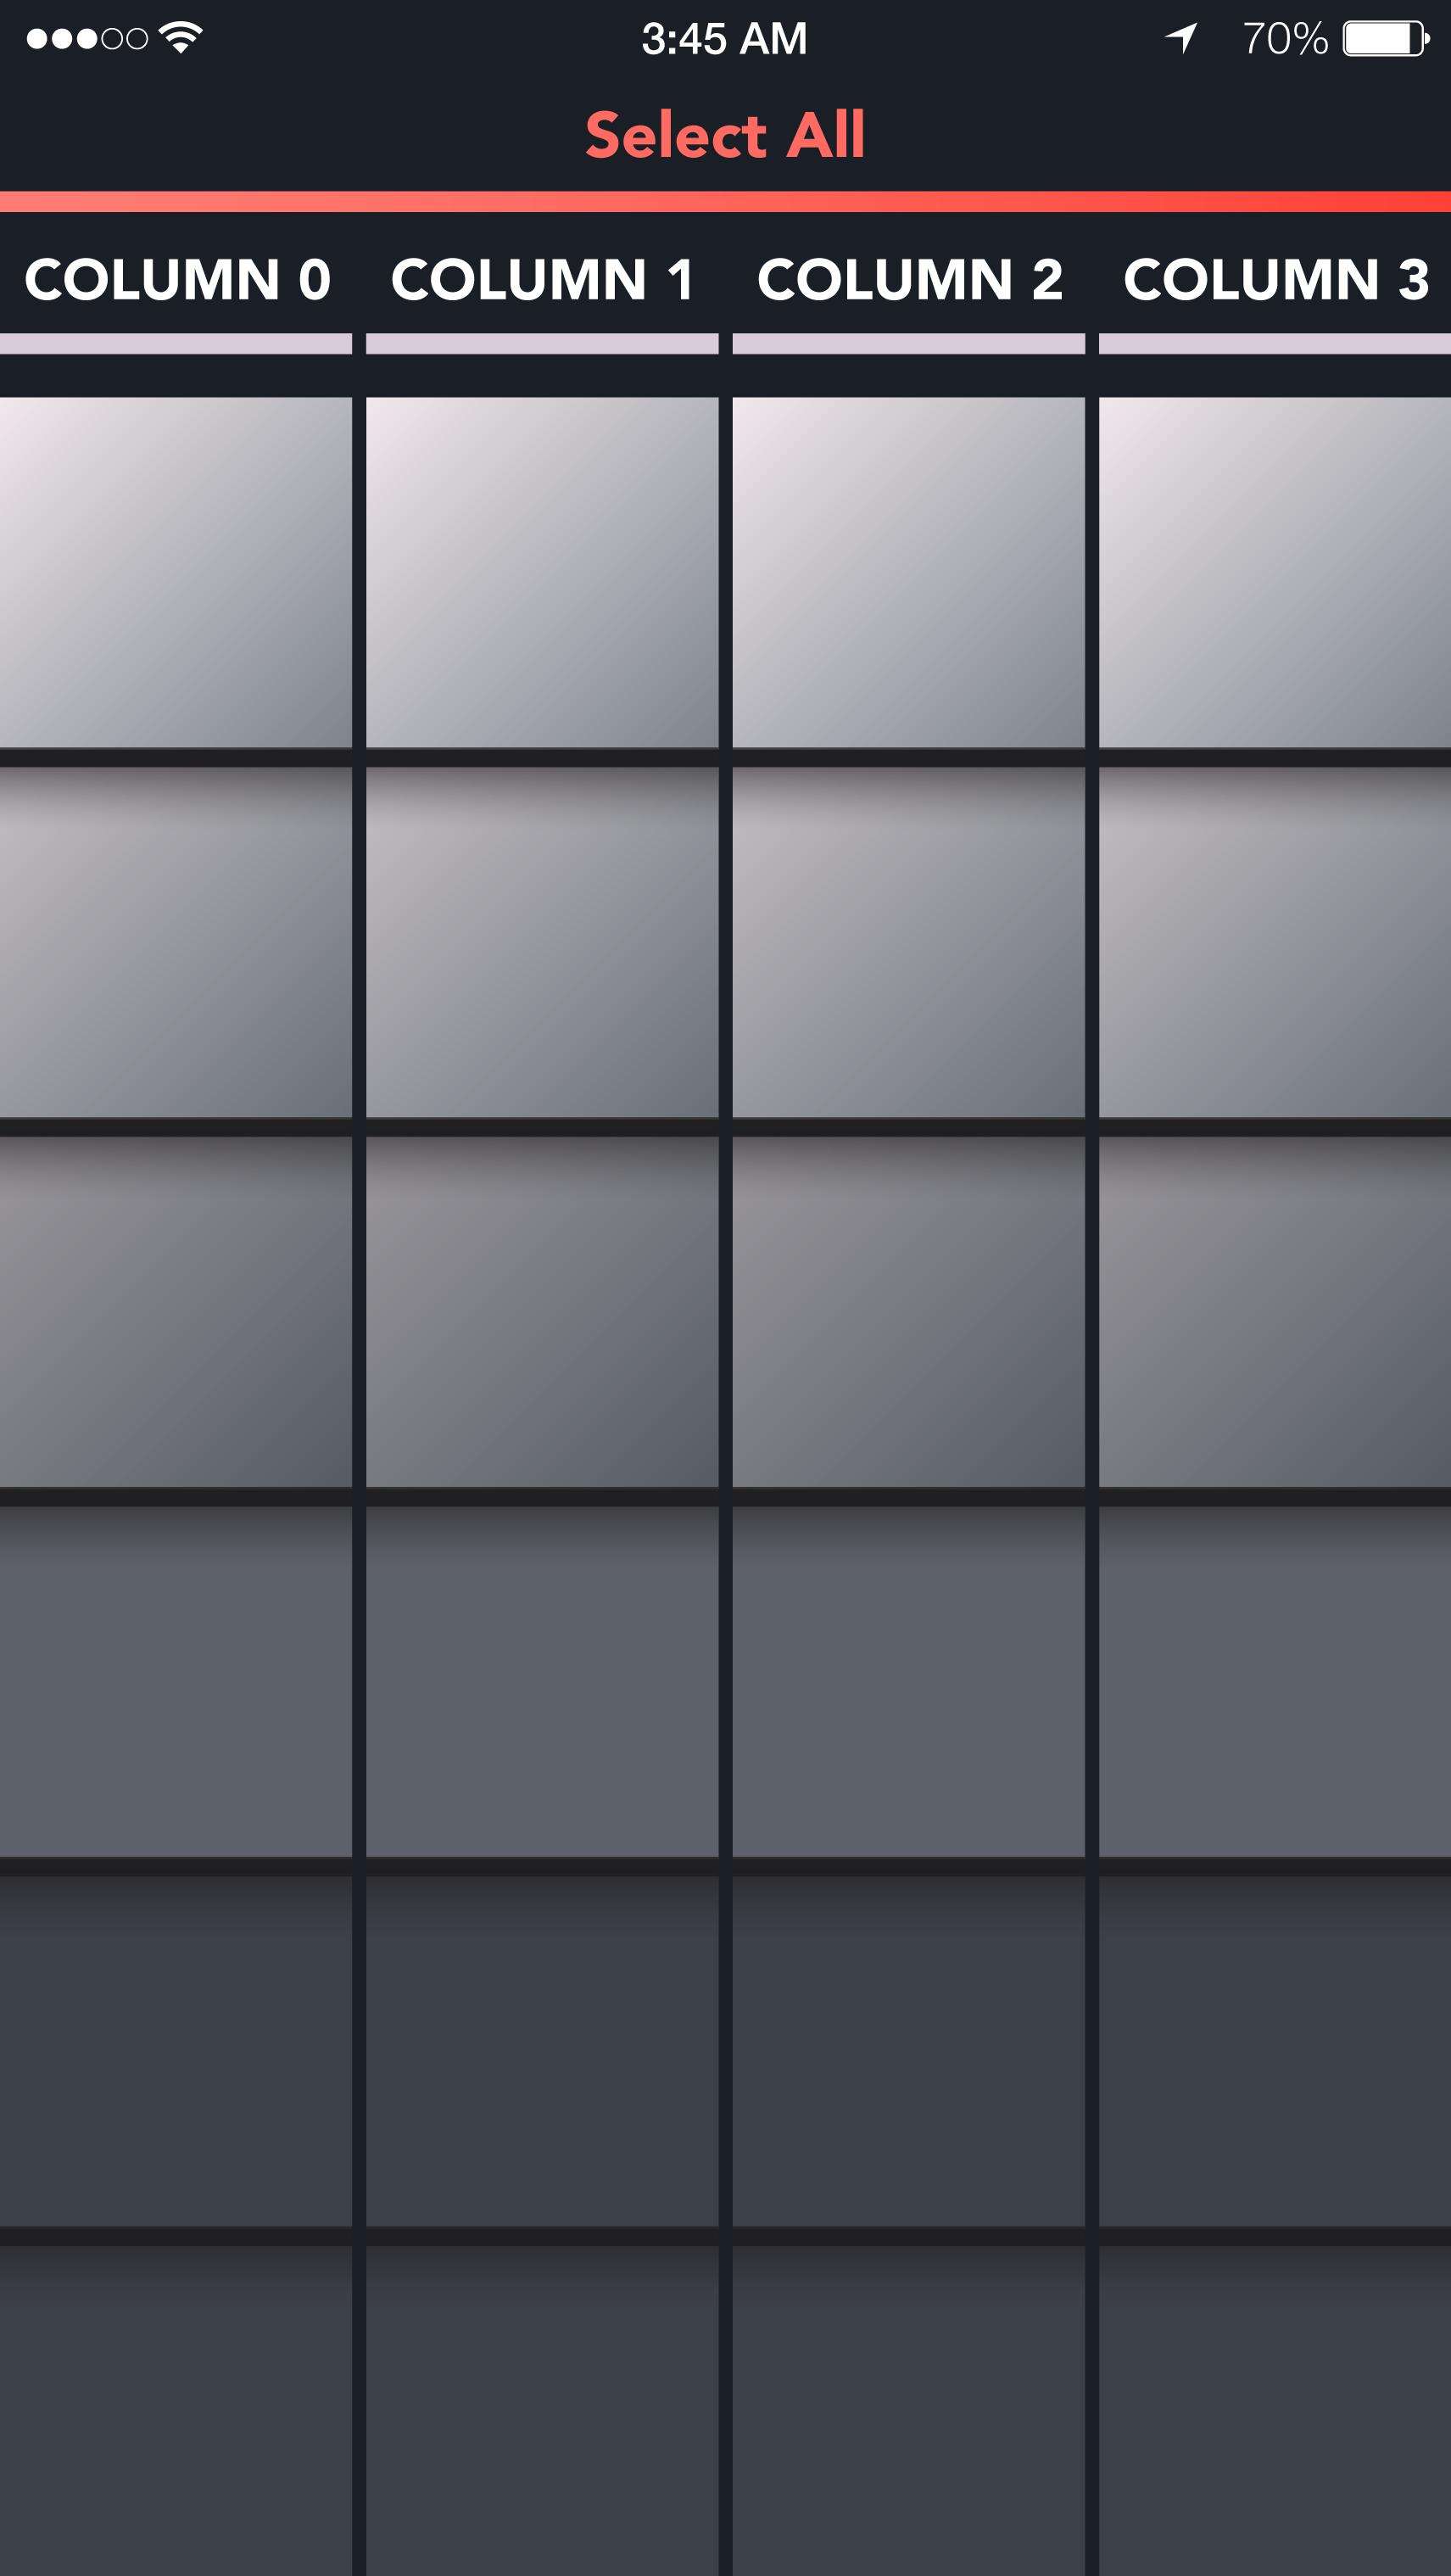 E2_Select - All.jpg